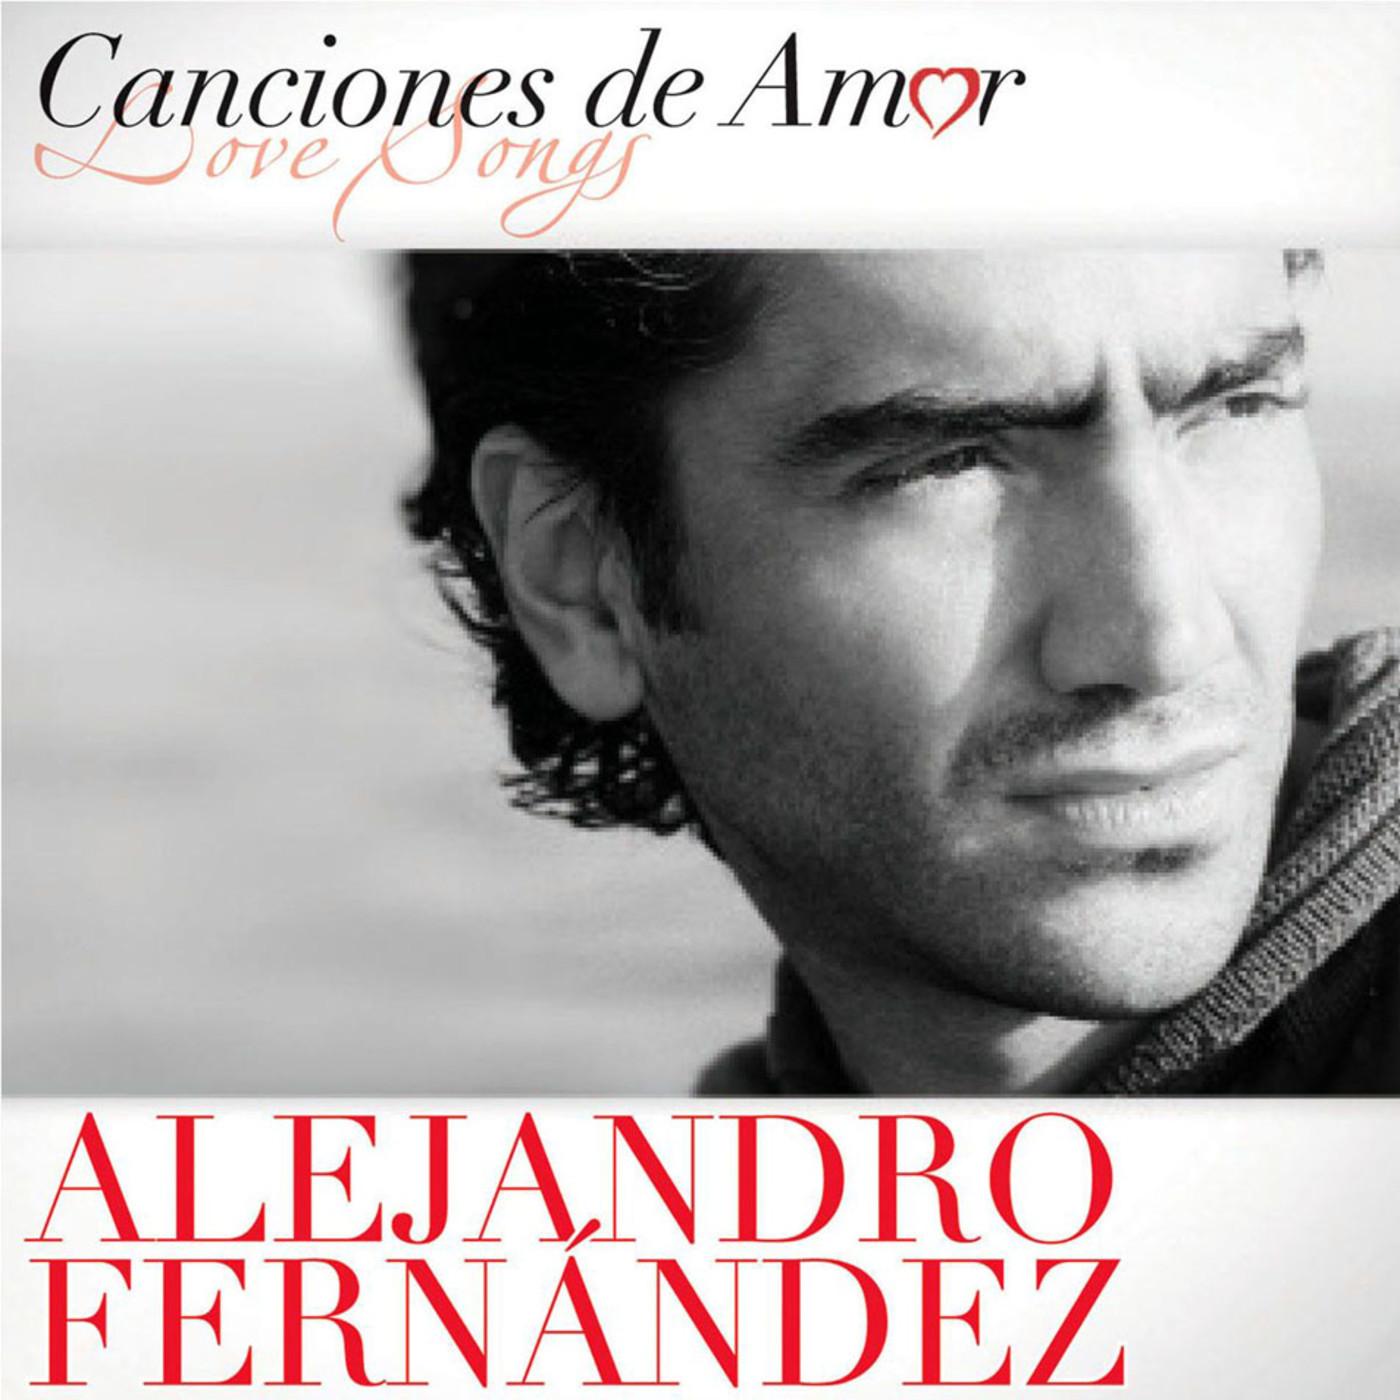 Alejandro fernandez abrazame en cieaseden en mp3 10 02 a for Alejandro fernandez en el jardin mp3